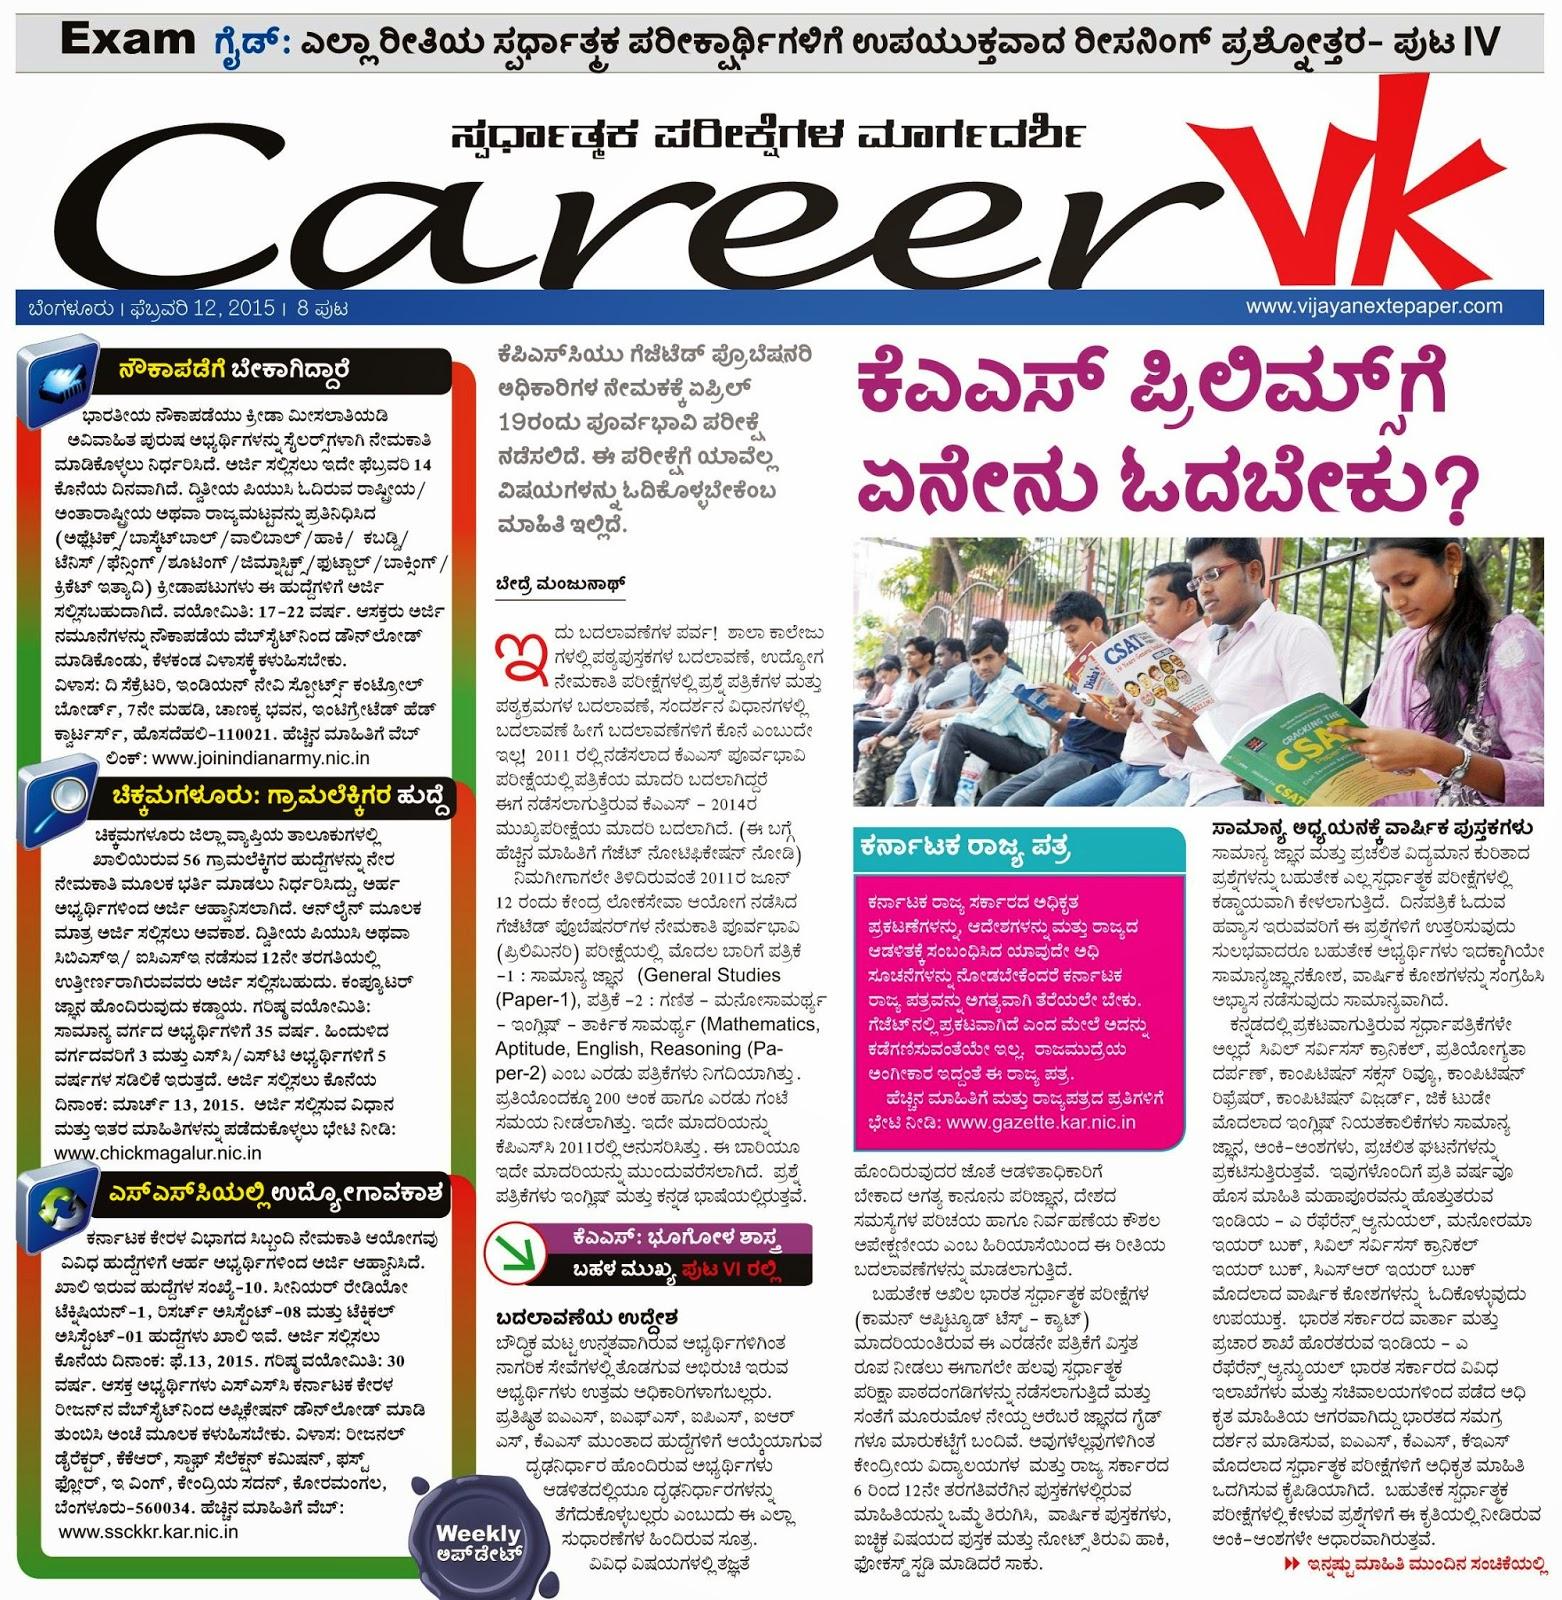 kpsc prelims books for kpsc prelims 2015 books for reference ready article part 1 vijaya next career vk 12 02 2015